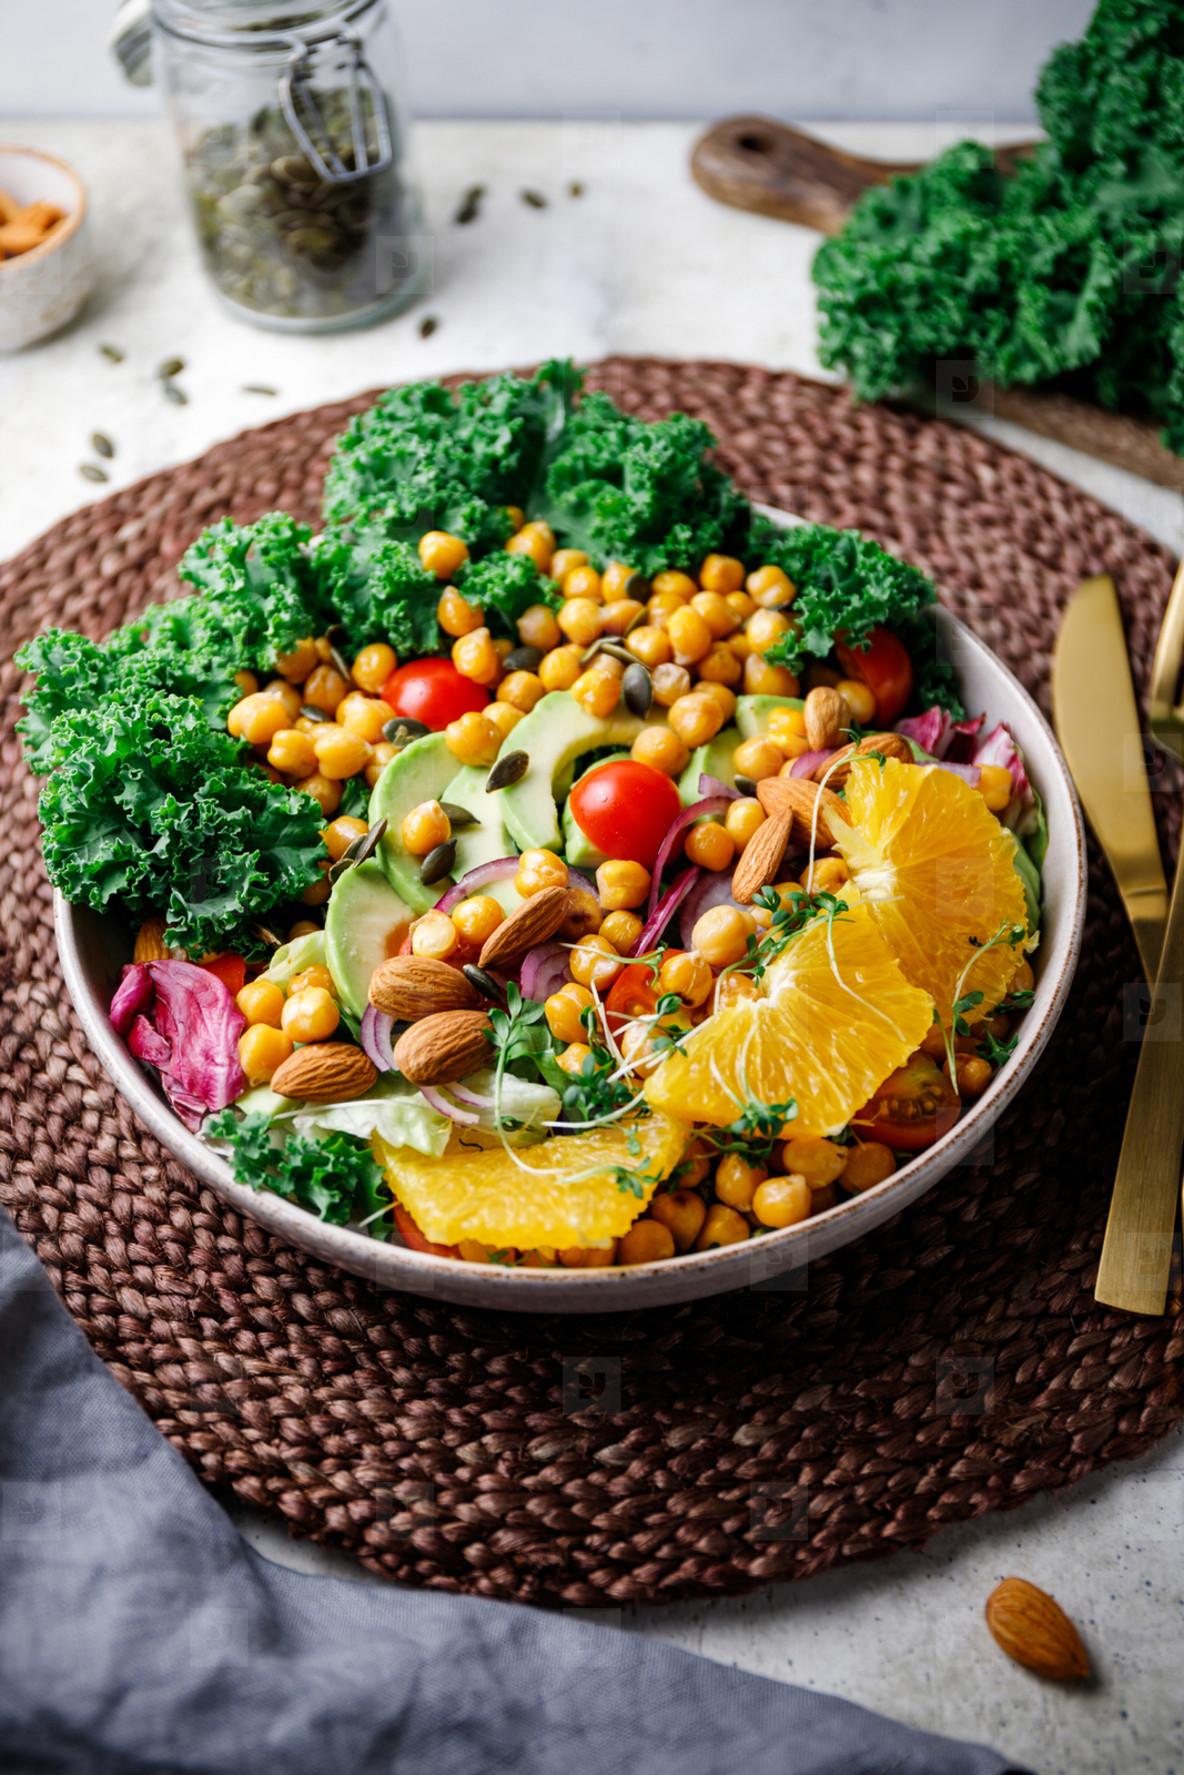 Healthy vegetarian salad with avocado  chickpea  fresh kale  romano leaf  cherry tomatoes  almond  onion and orange